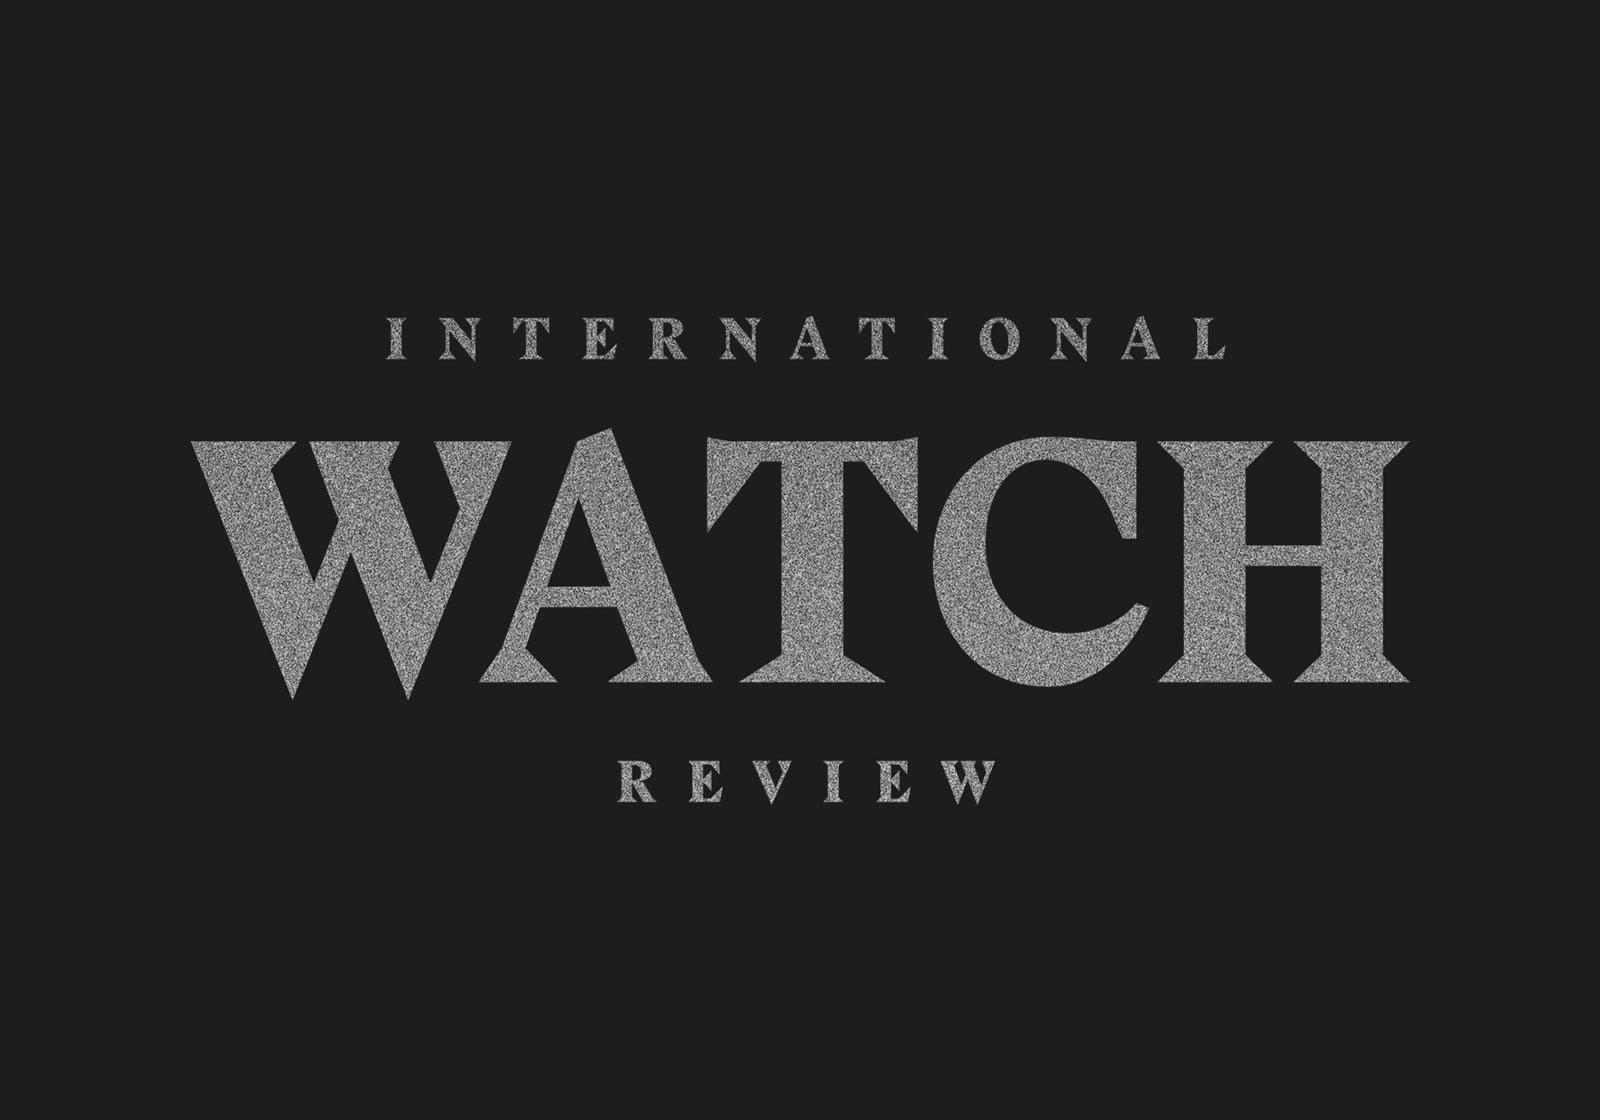 création logo de l'international watch review